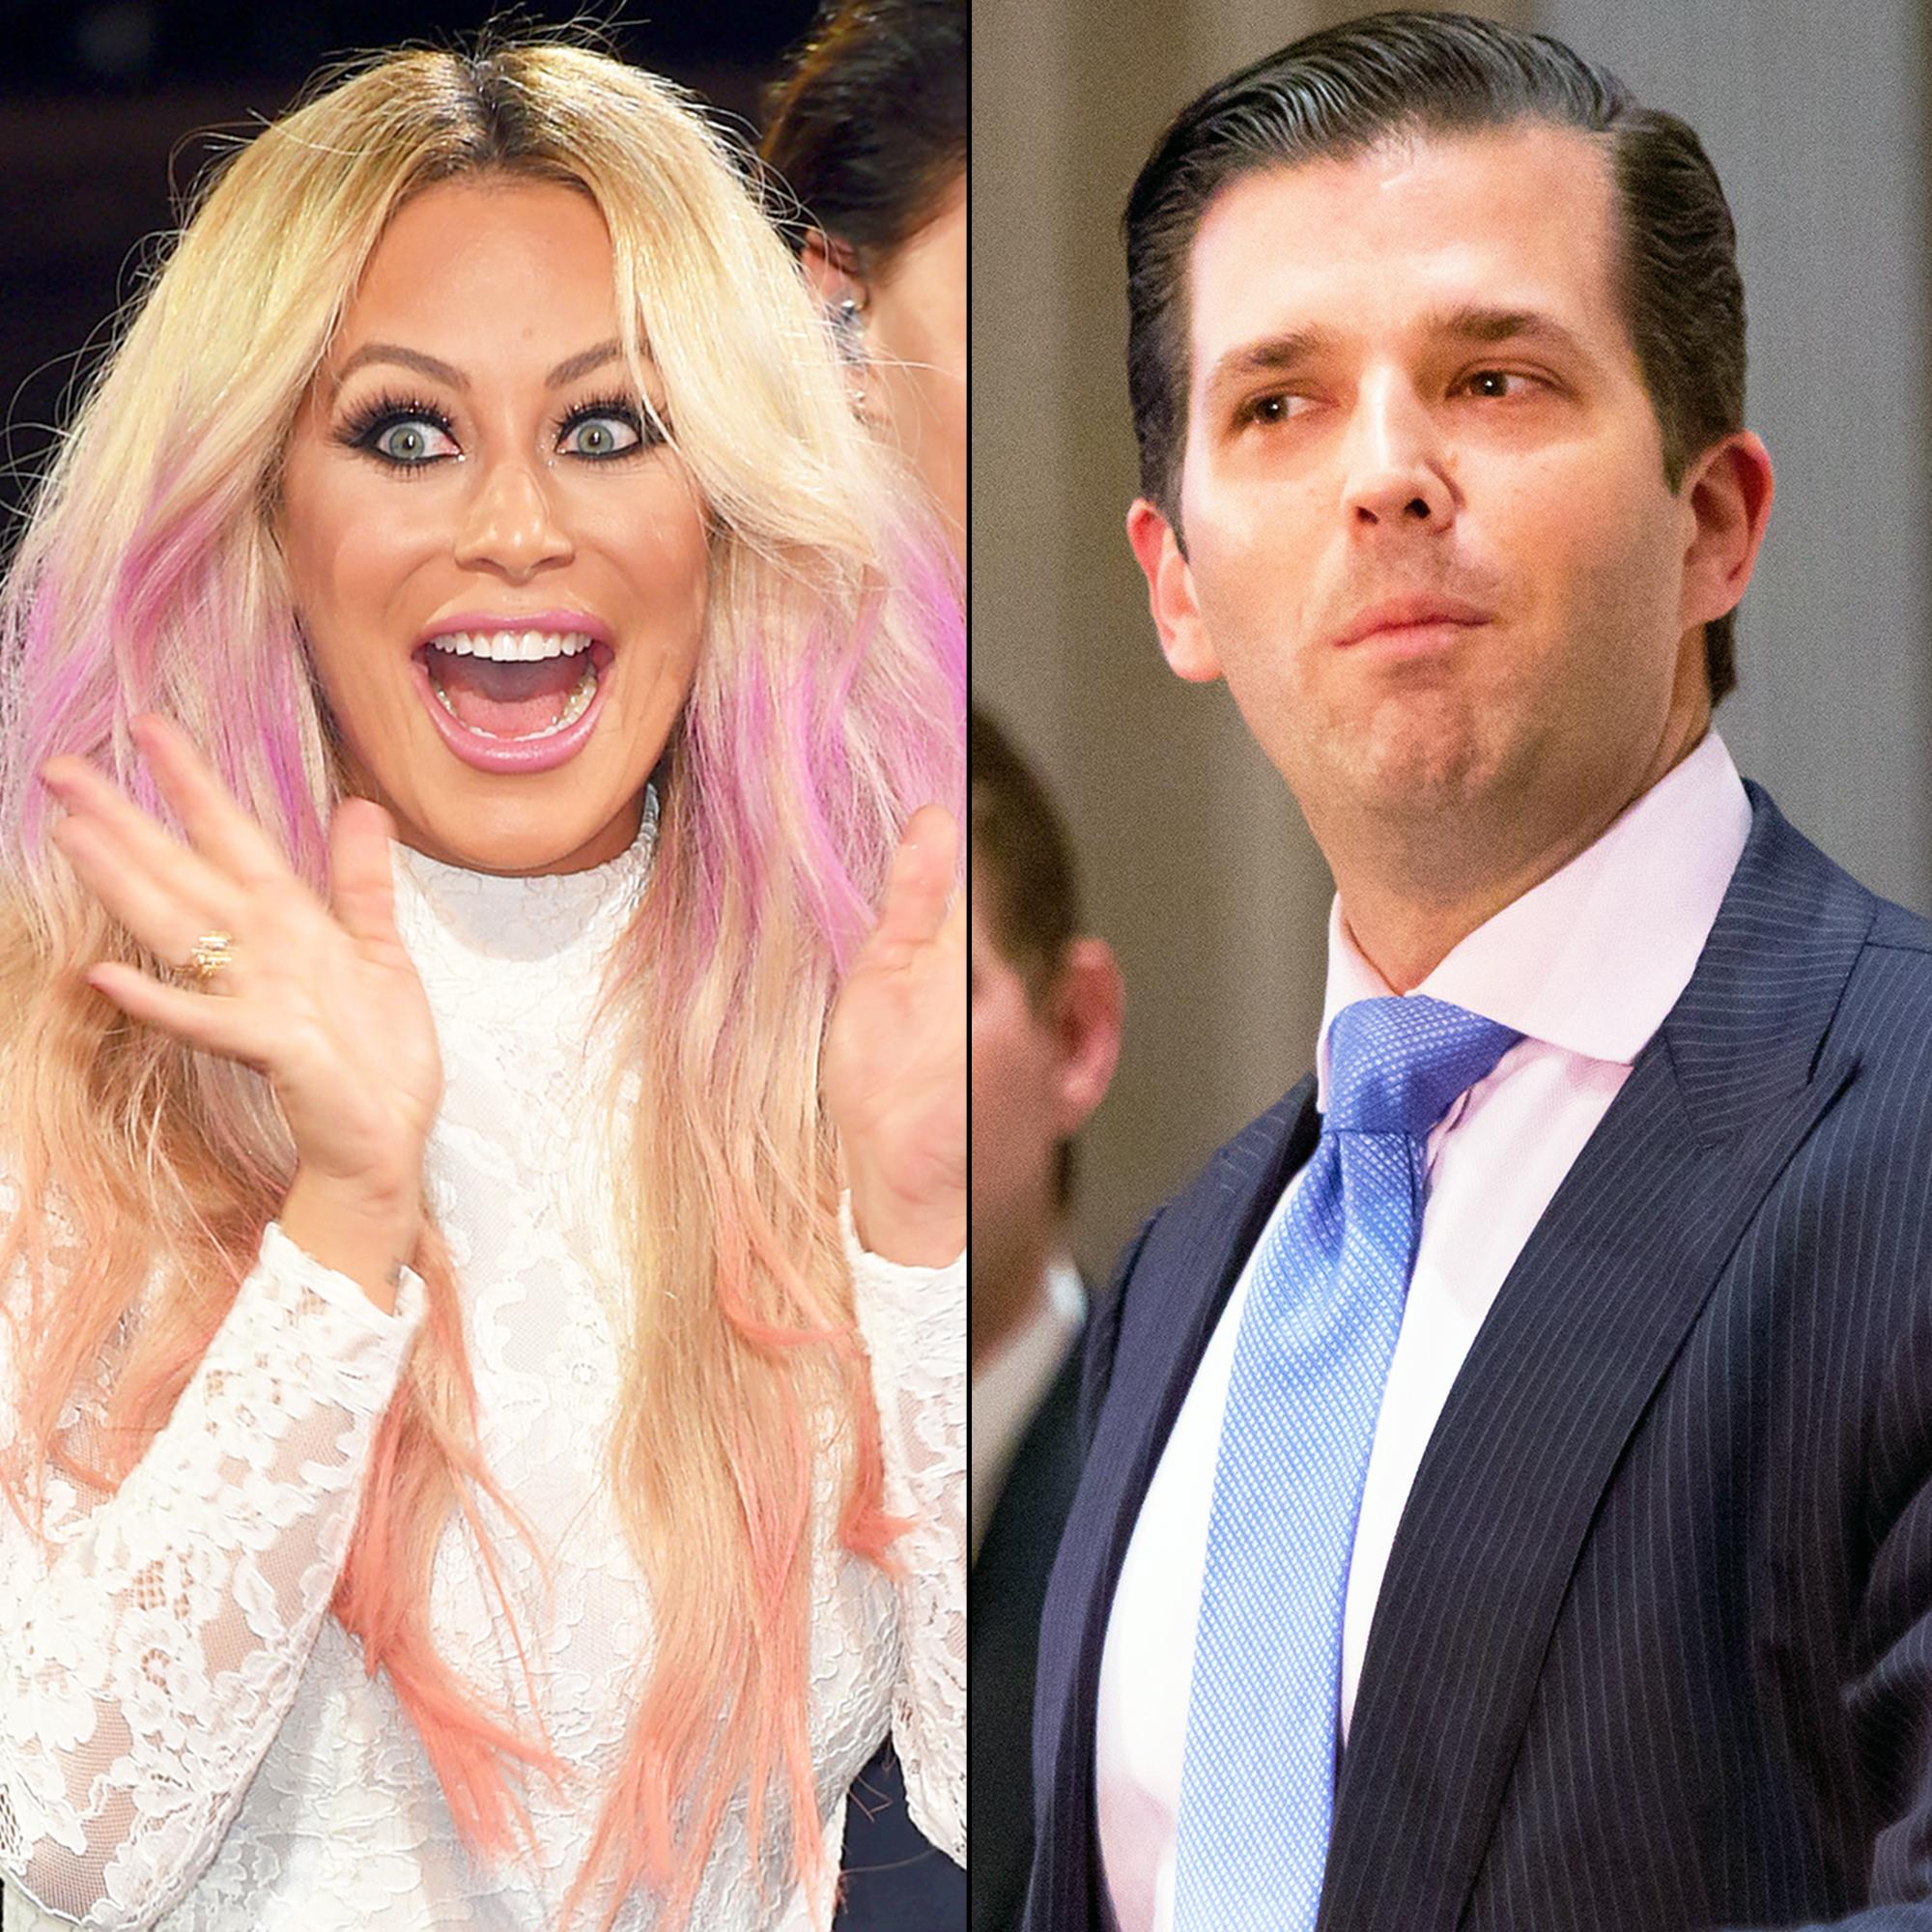 Aubrey O'Day and Donald Trump Jr.